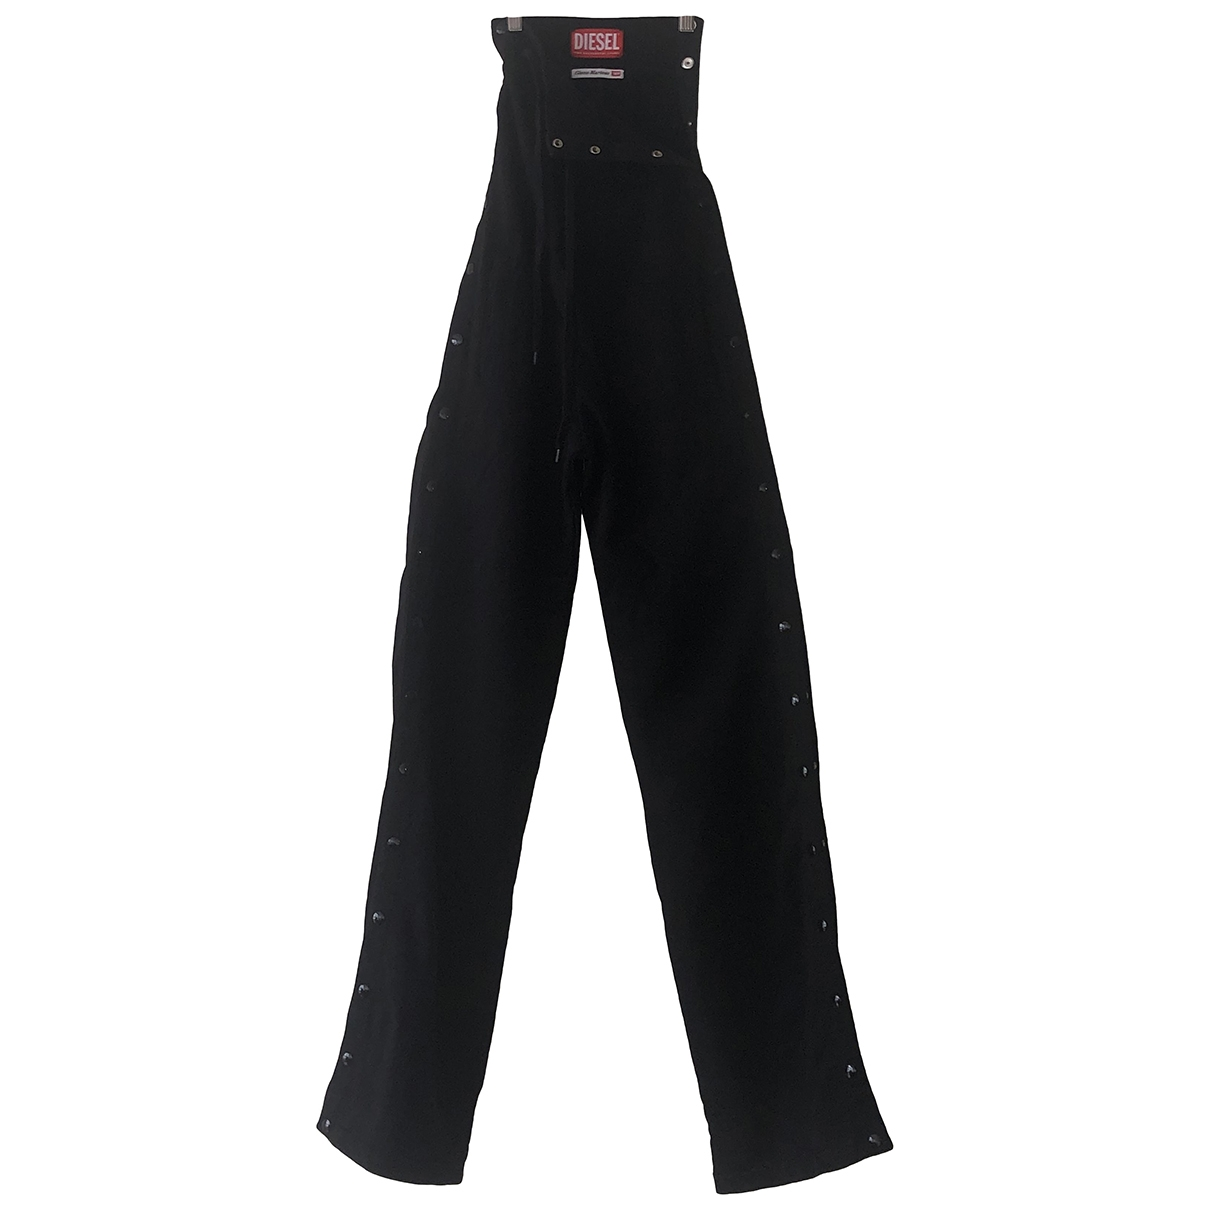 Diesel \N Black Cotton Trousers for Women S International